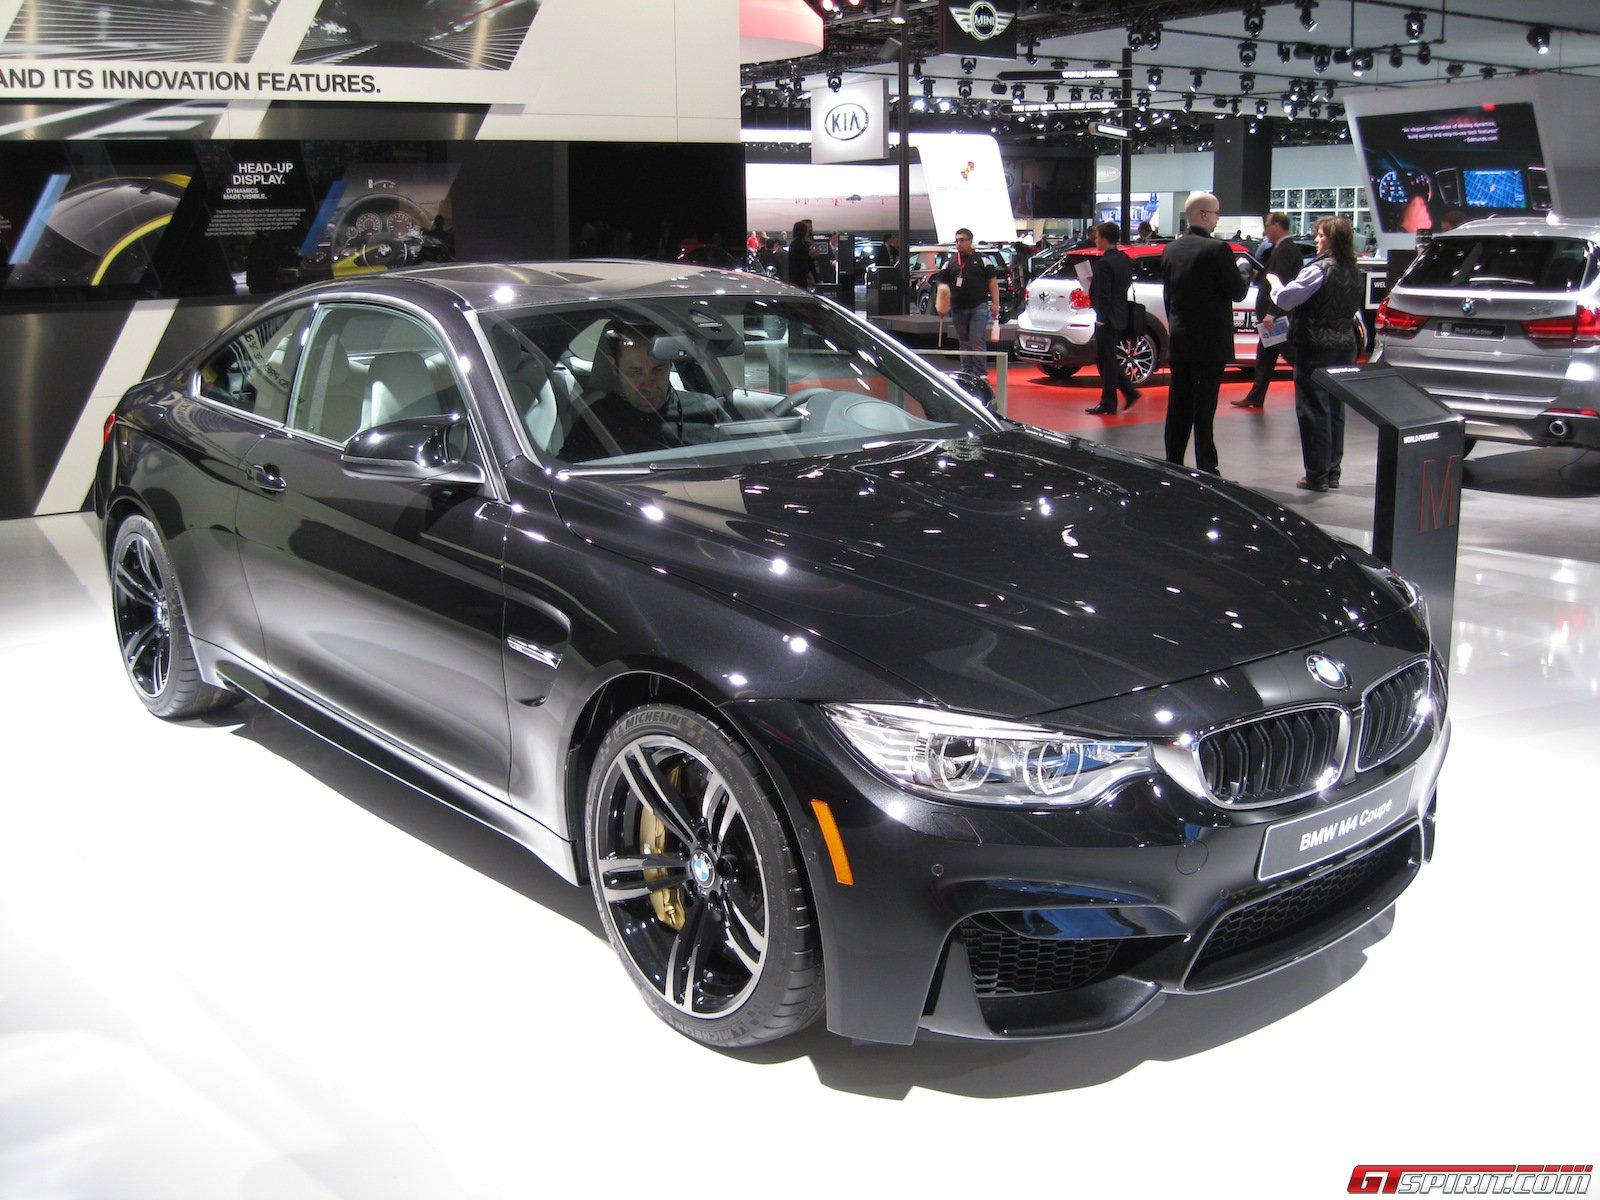 Detroit Black Sapphire BMW M Coupe GTspirit - 2014 bmw m4 msrp